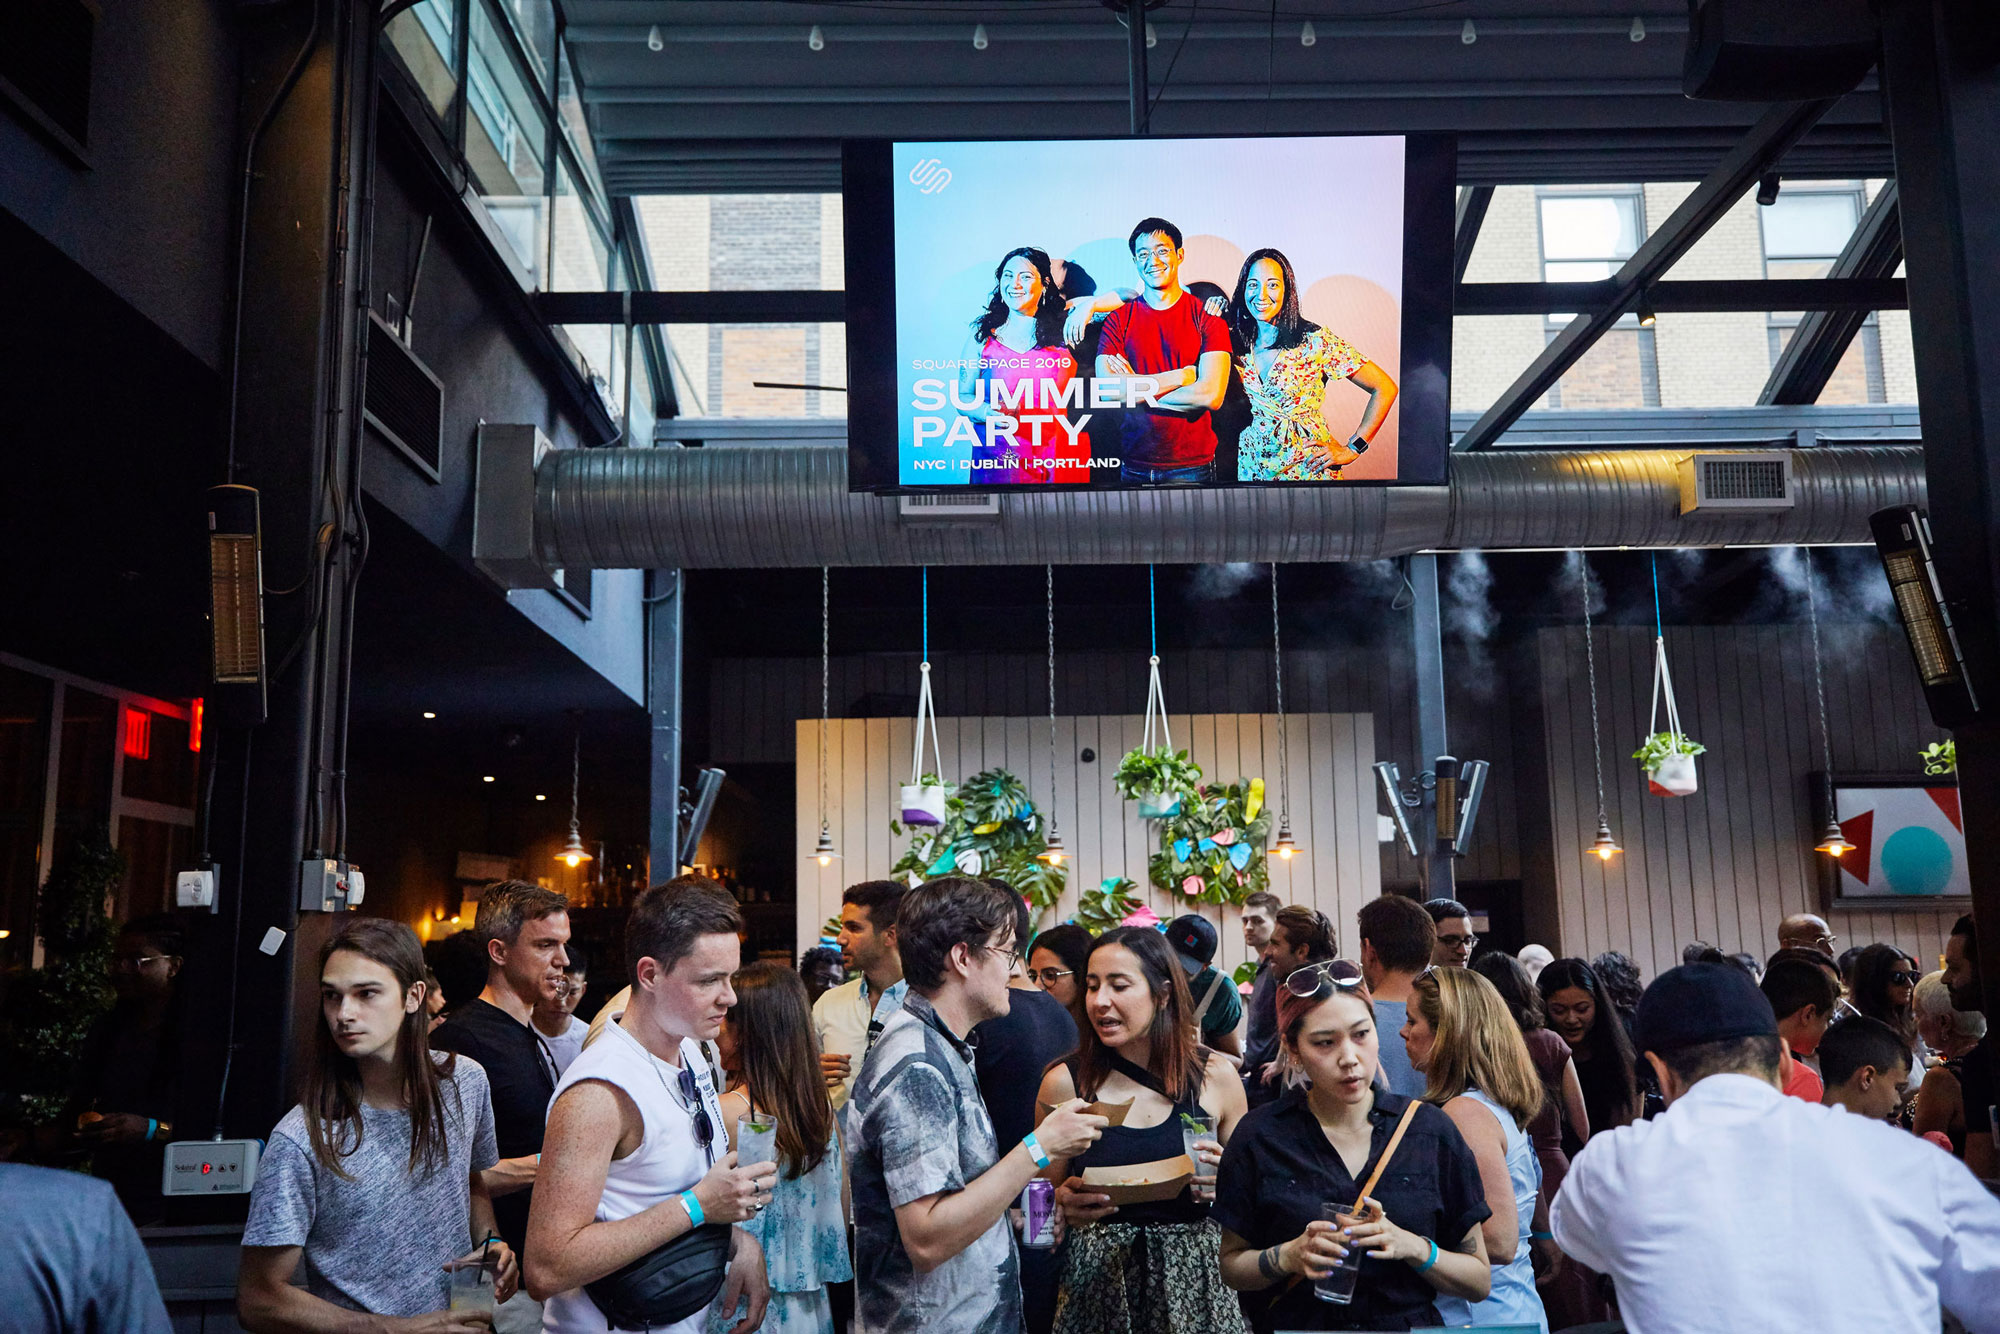 SquareSpace_Summer_Party-Versa-NYC-2019.jpg